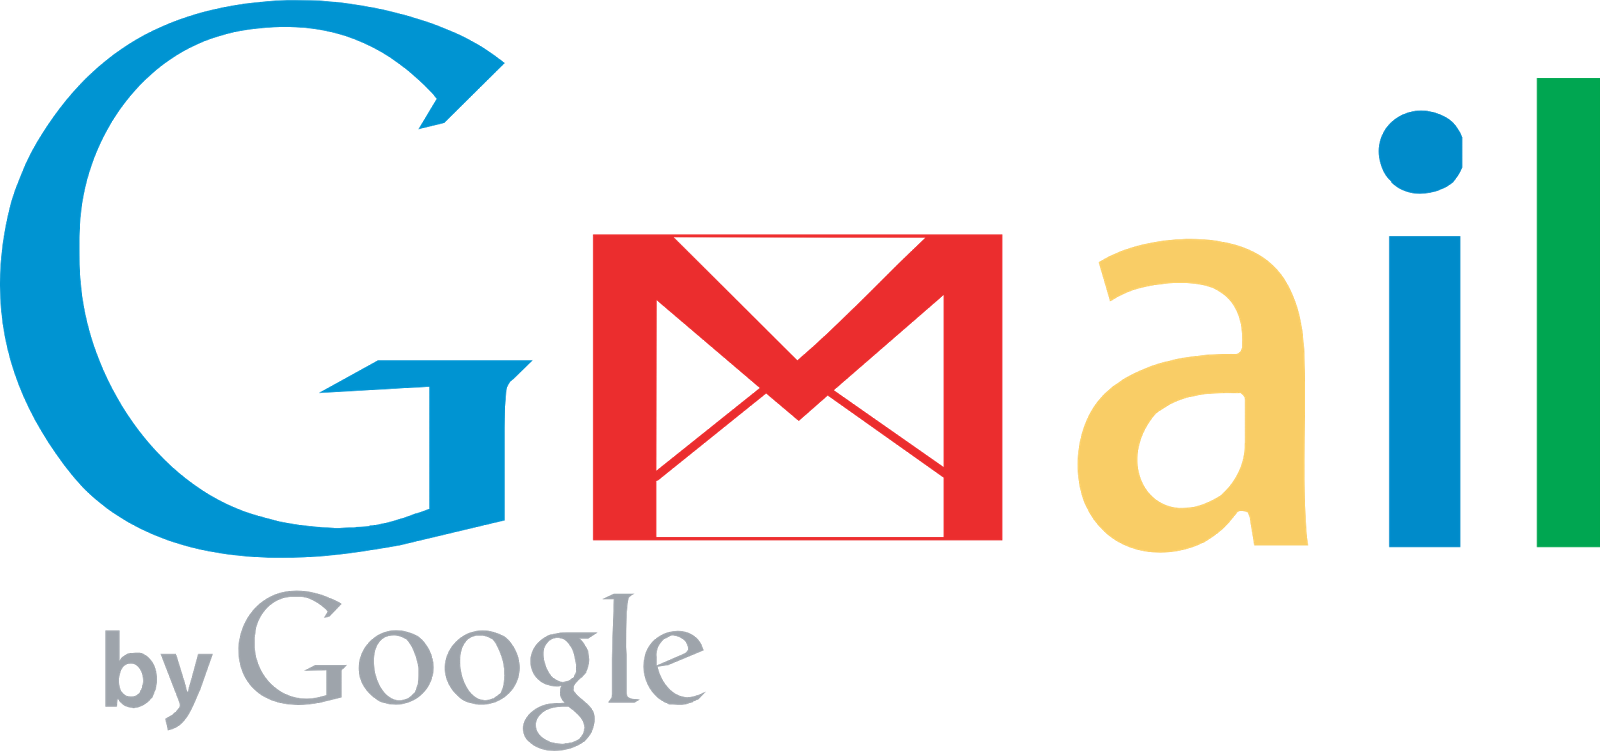 /gmail-identity-strategic-focus-ce82188d0019 feature image